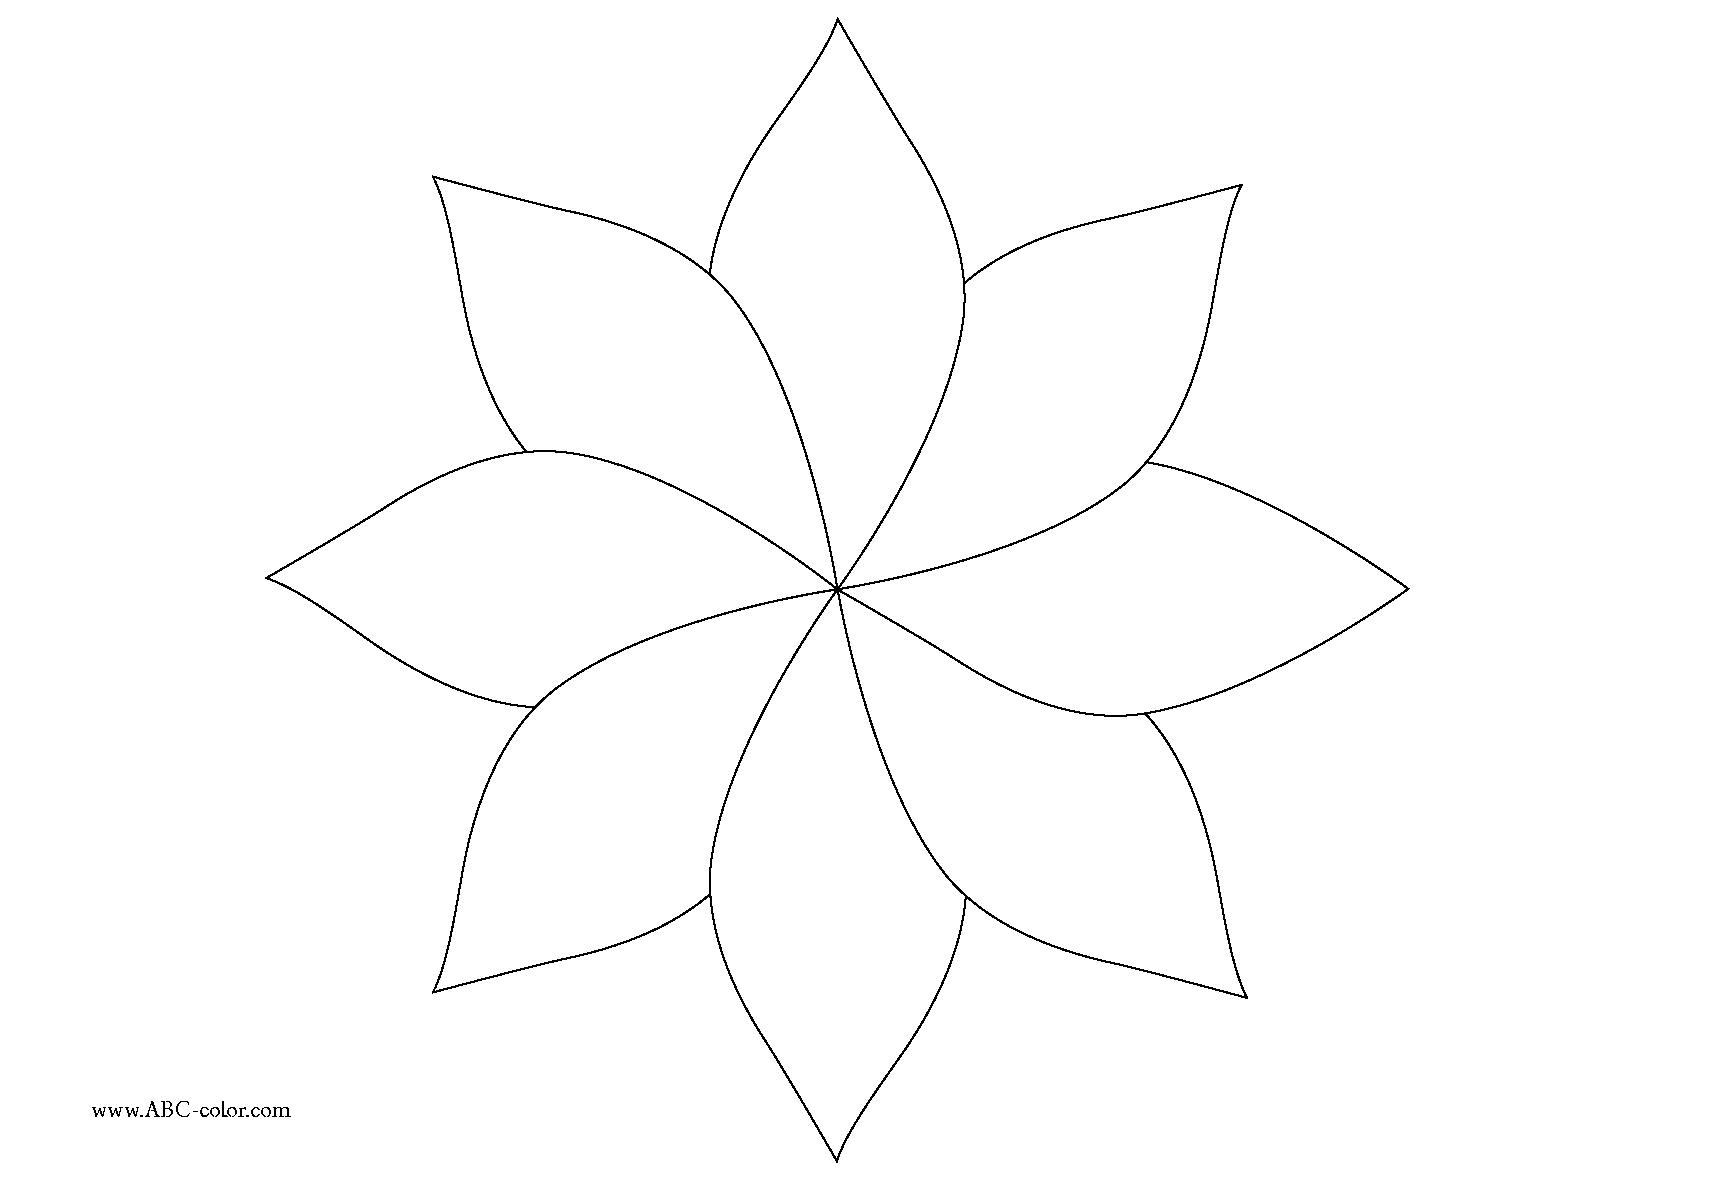 Flower Petal Drawing at GetDrawings.com | Free for ...